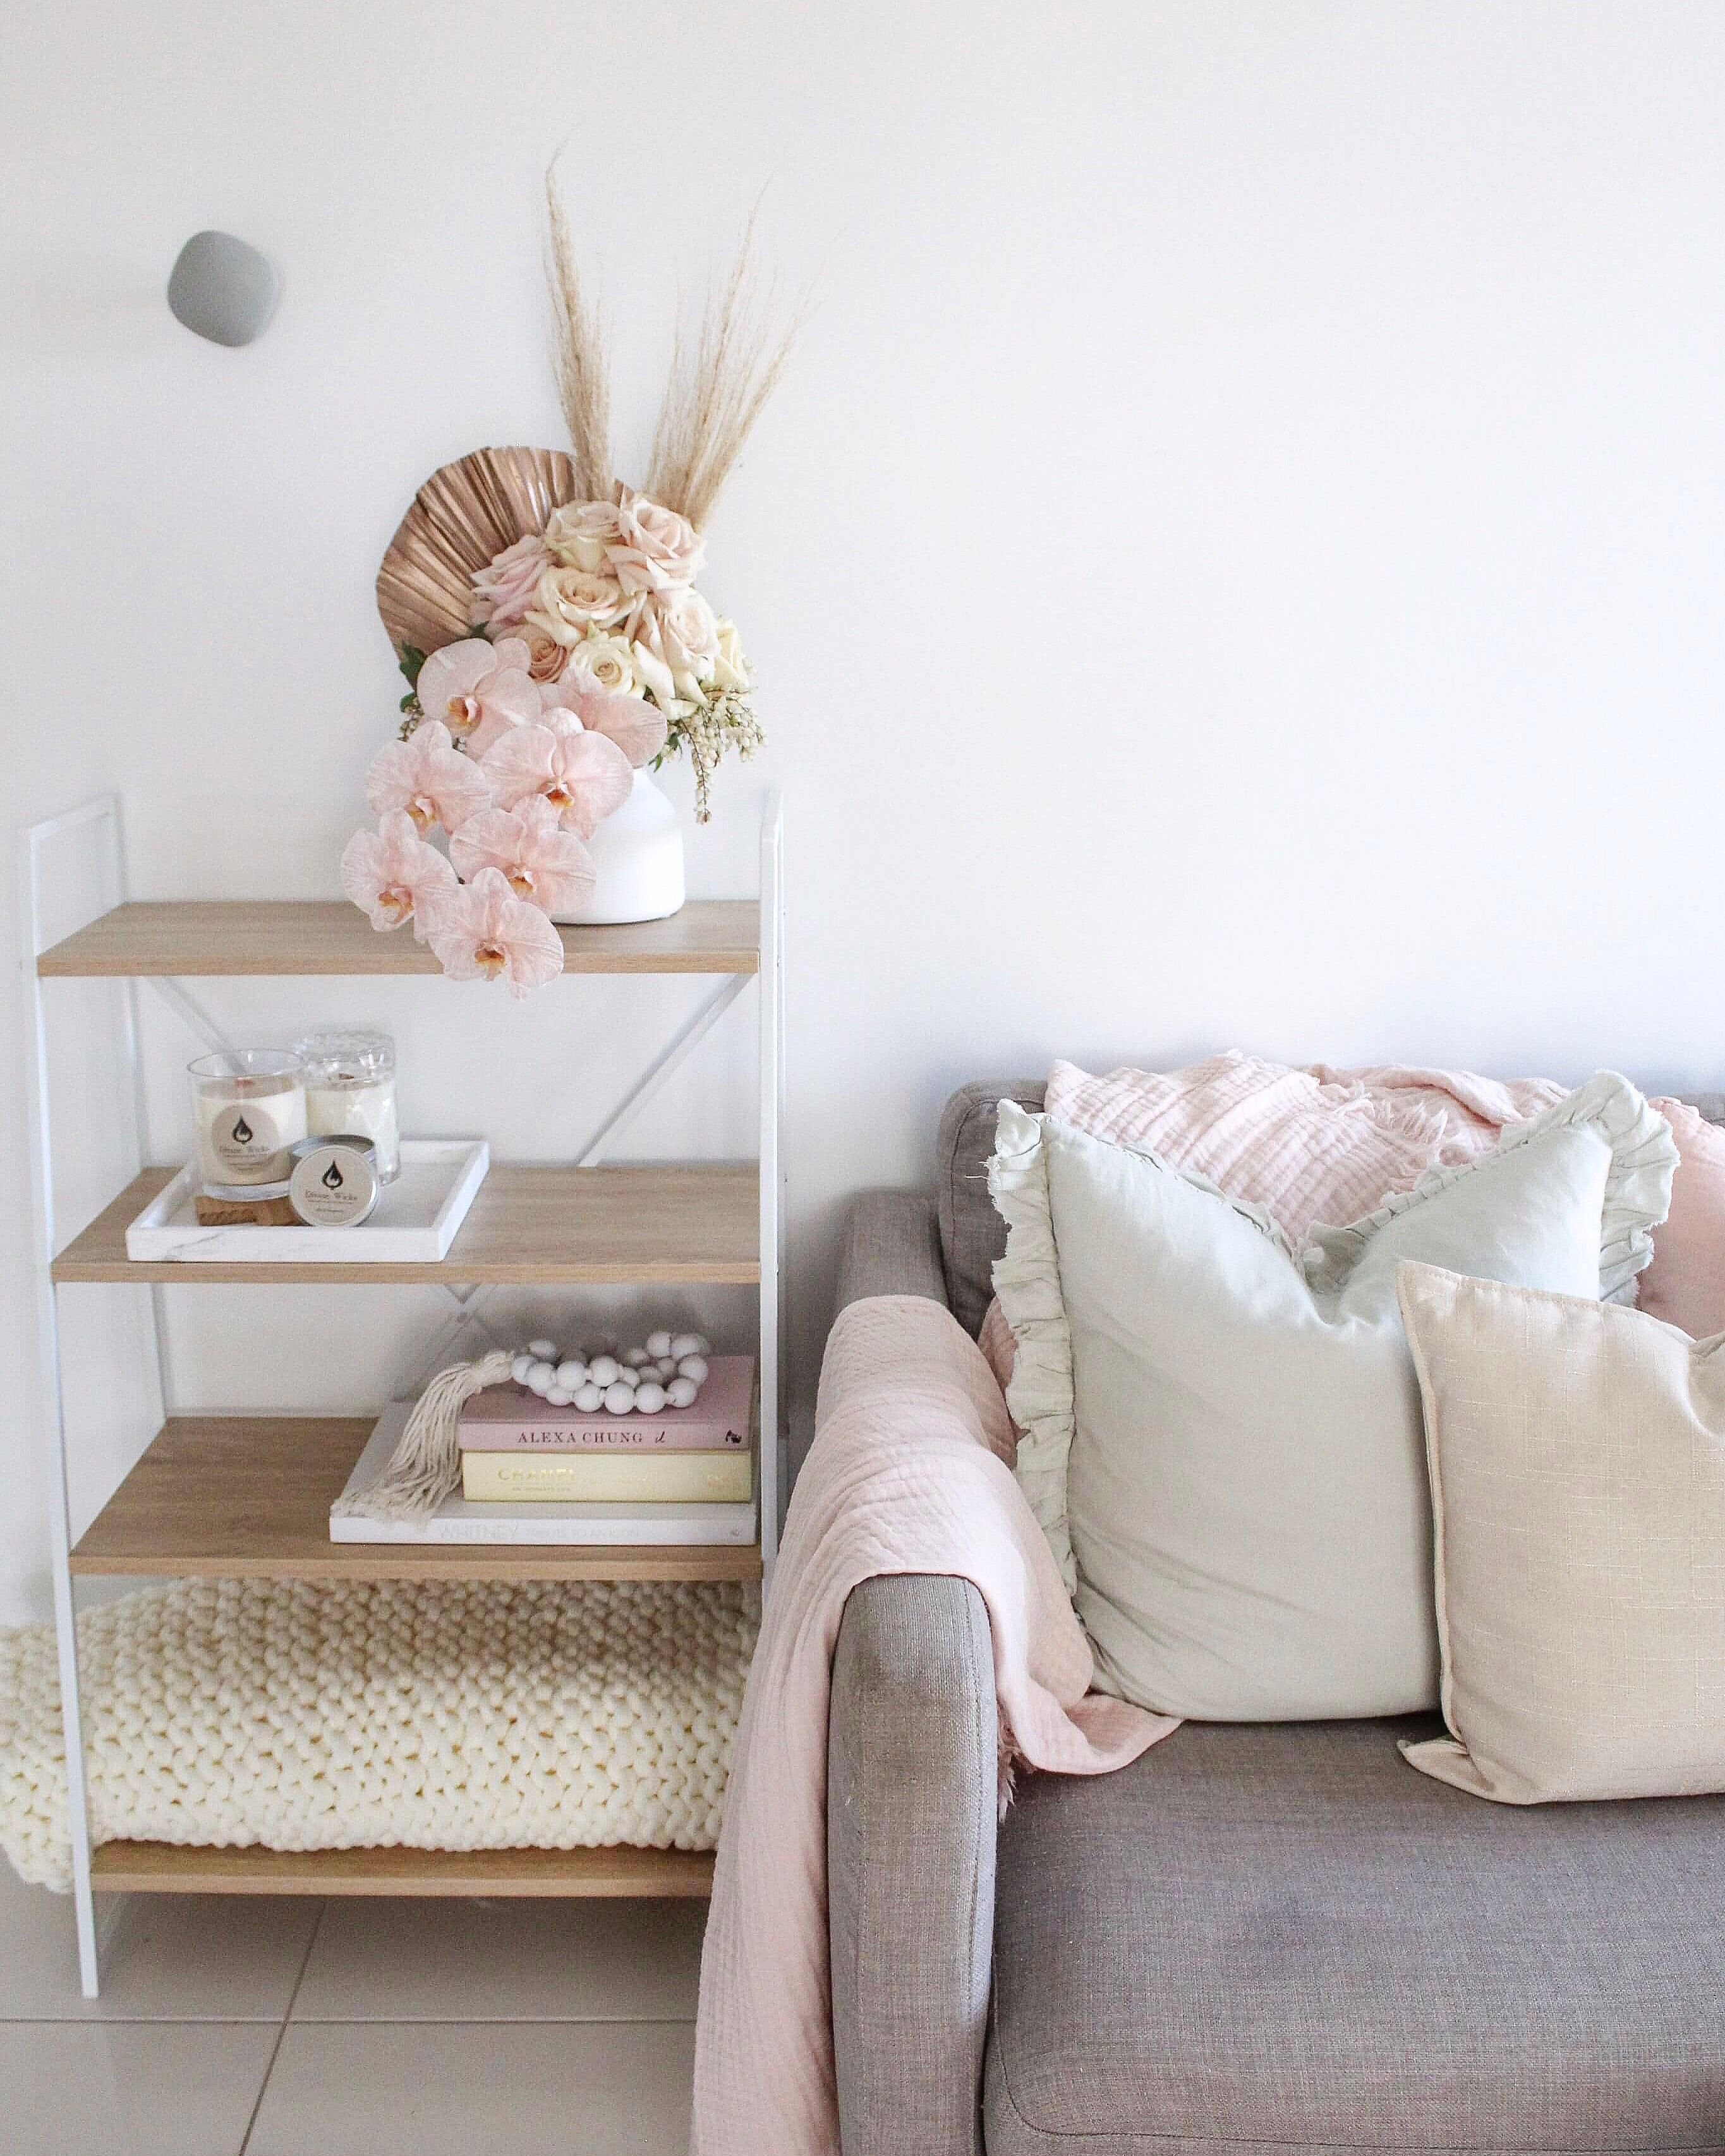 Homedecor Kmart Cushions Candles Livingroom Freedom Flowers